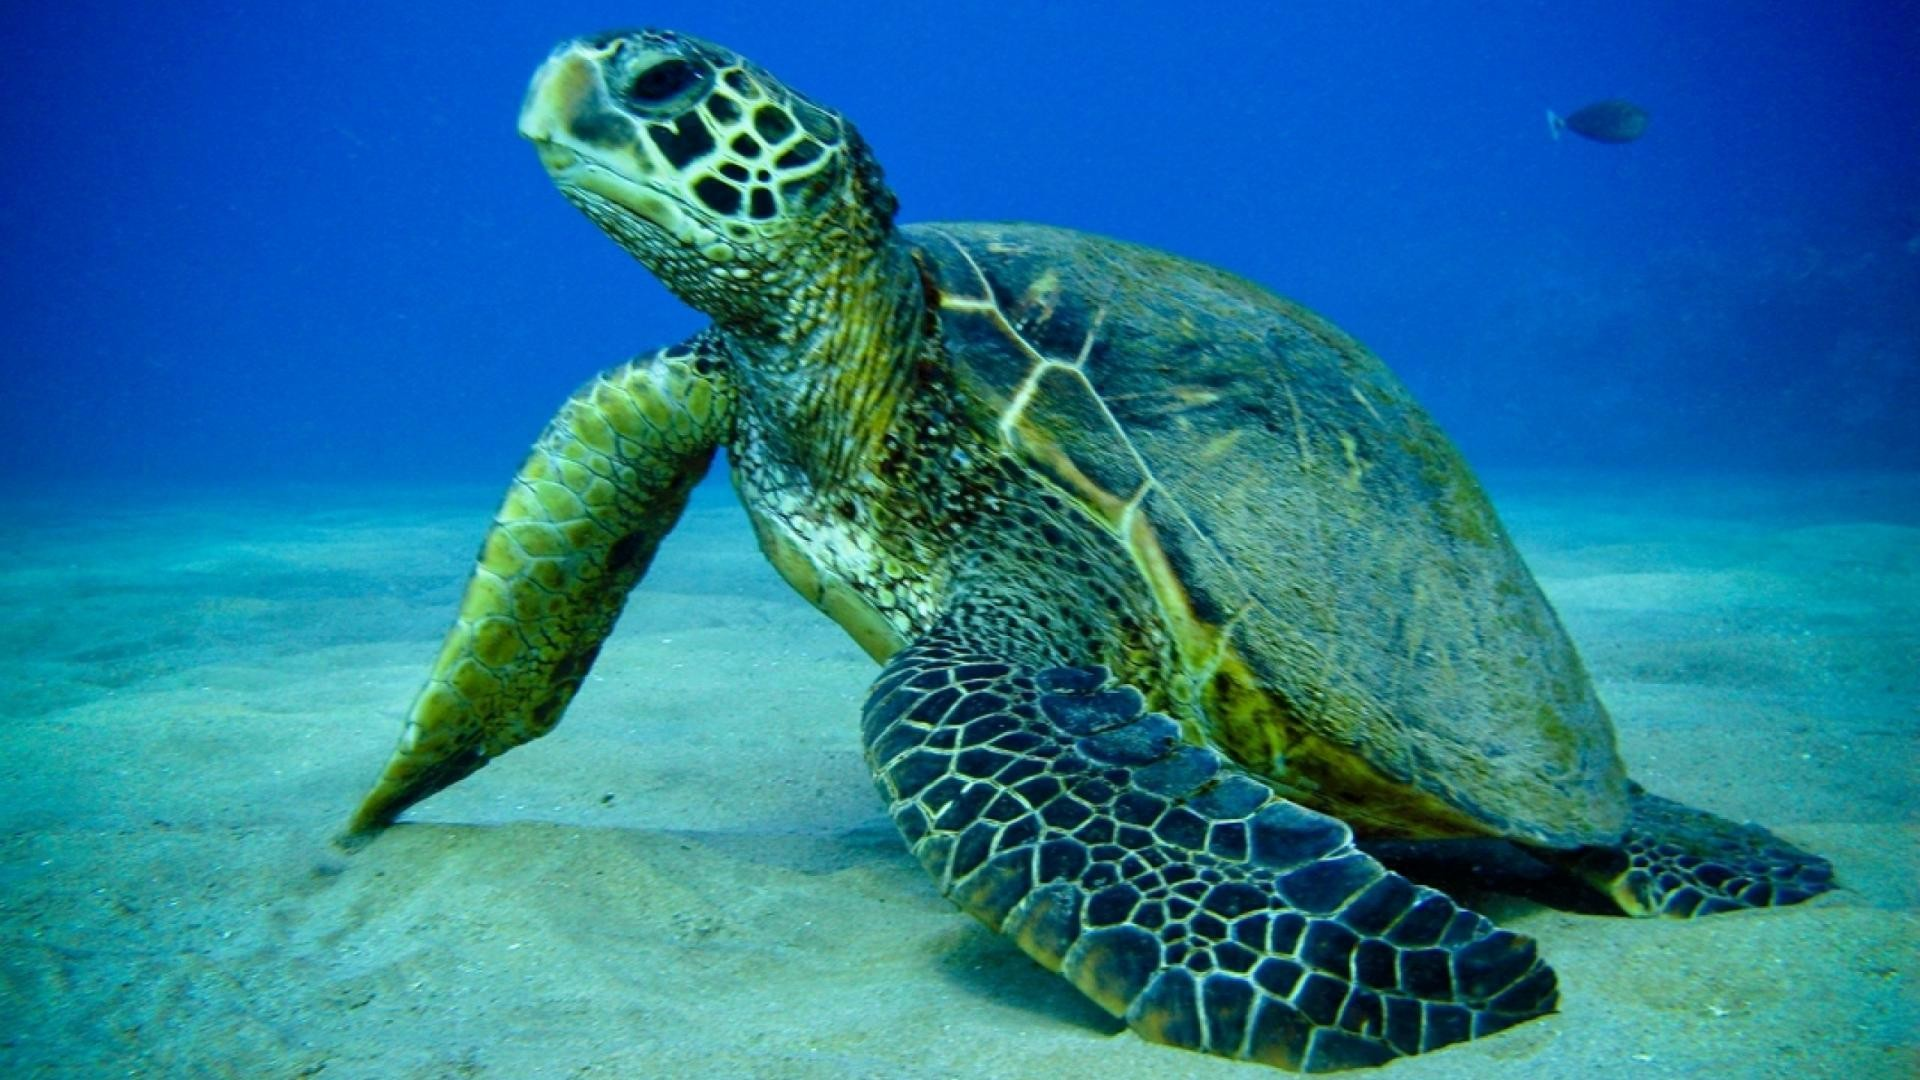 54 Sea Turtle Wallpaper Backgrounds